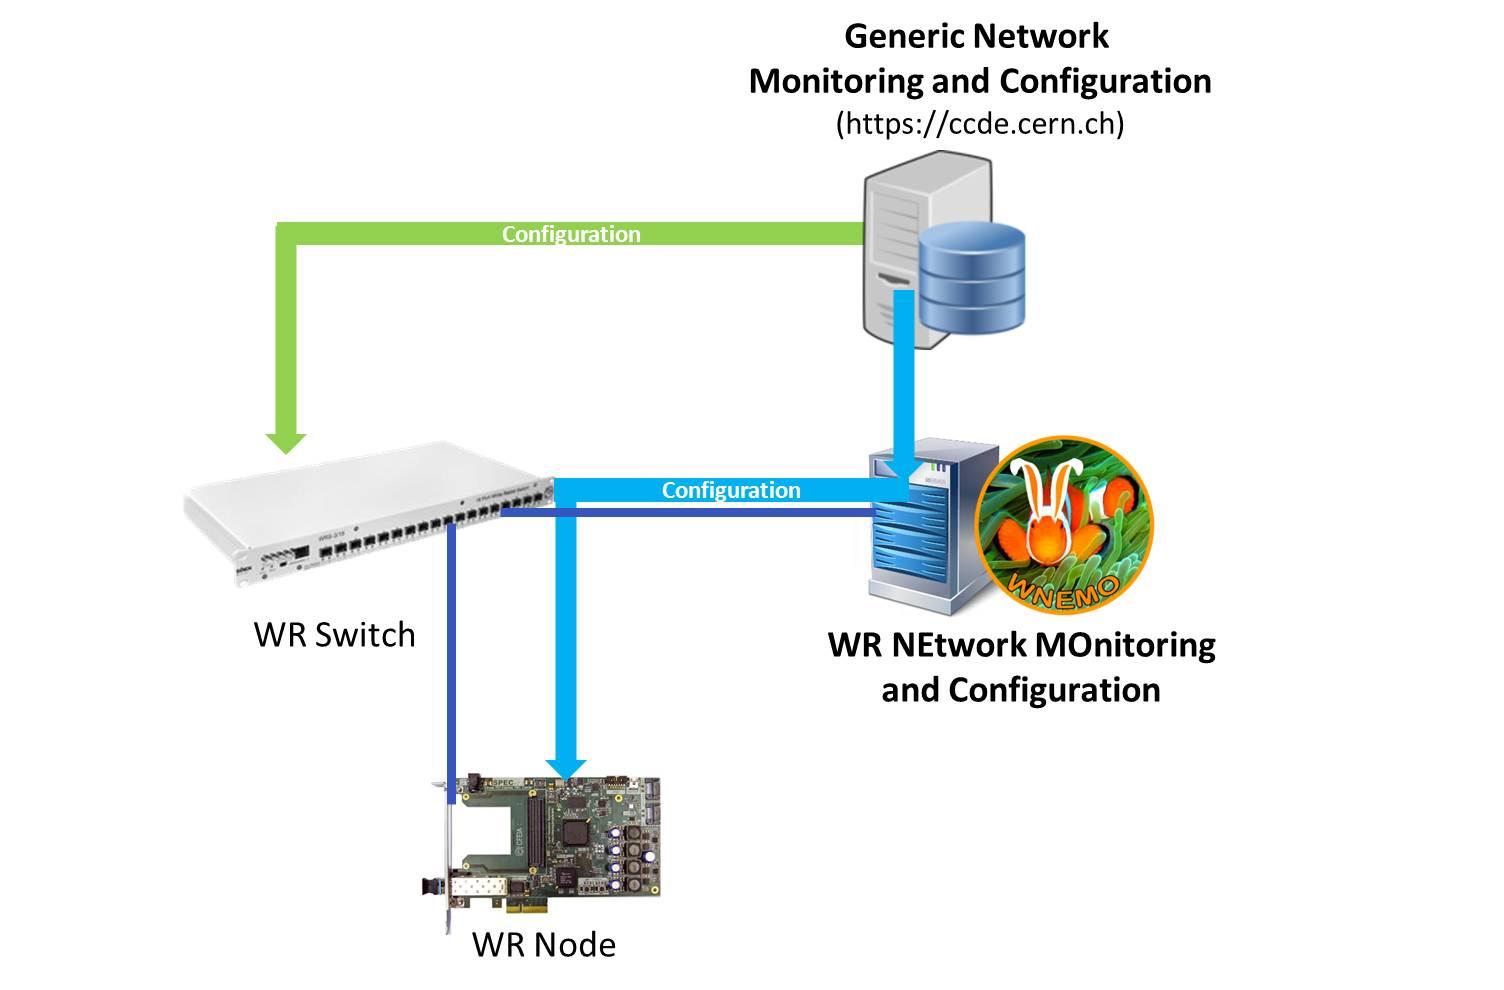 figures/management/MonitoringConfig-3-config.jpg